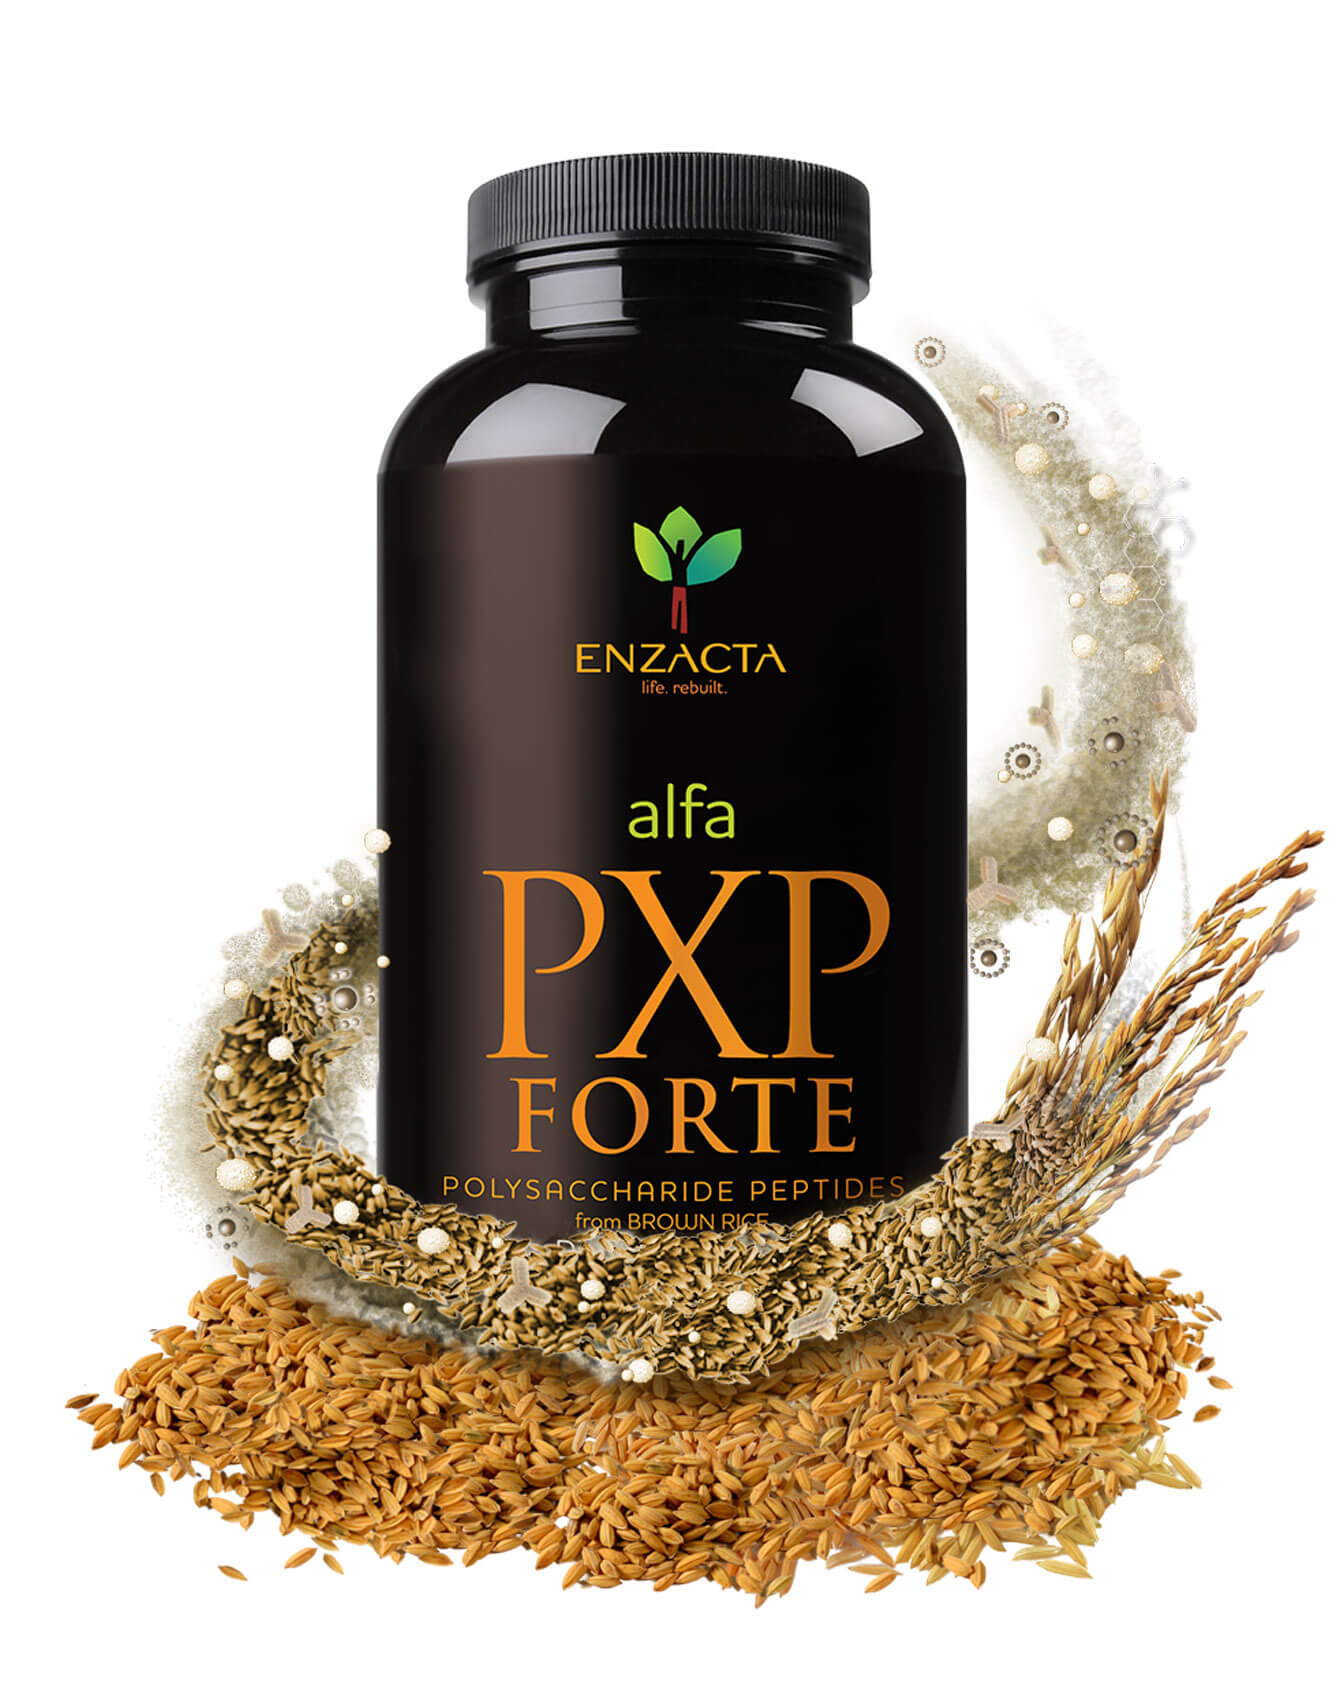 alfa PXP FORTE - Bottle ingredients